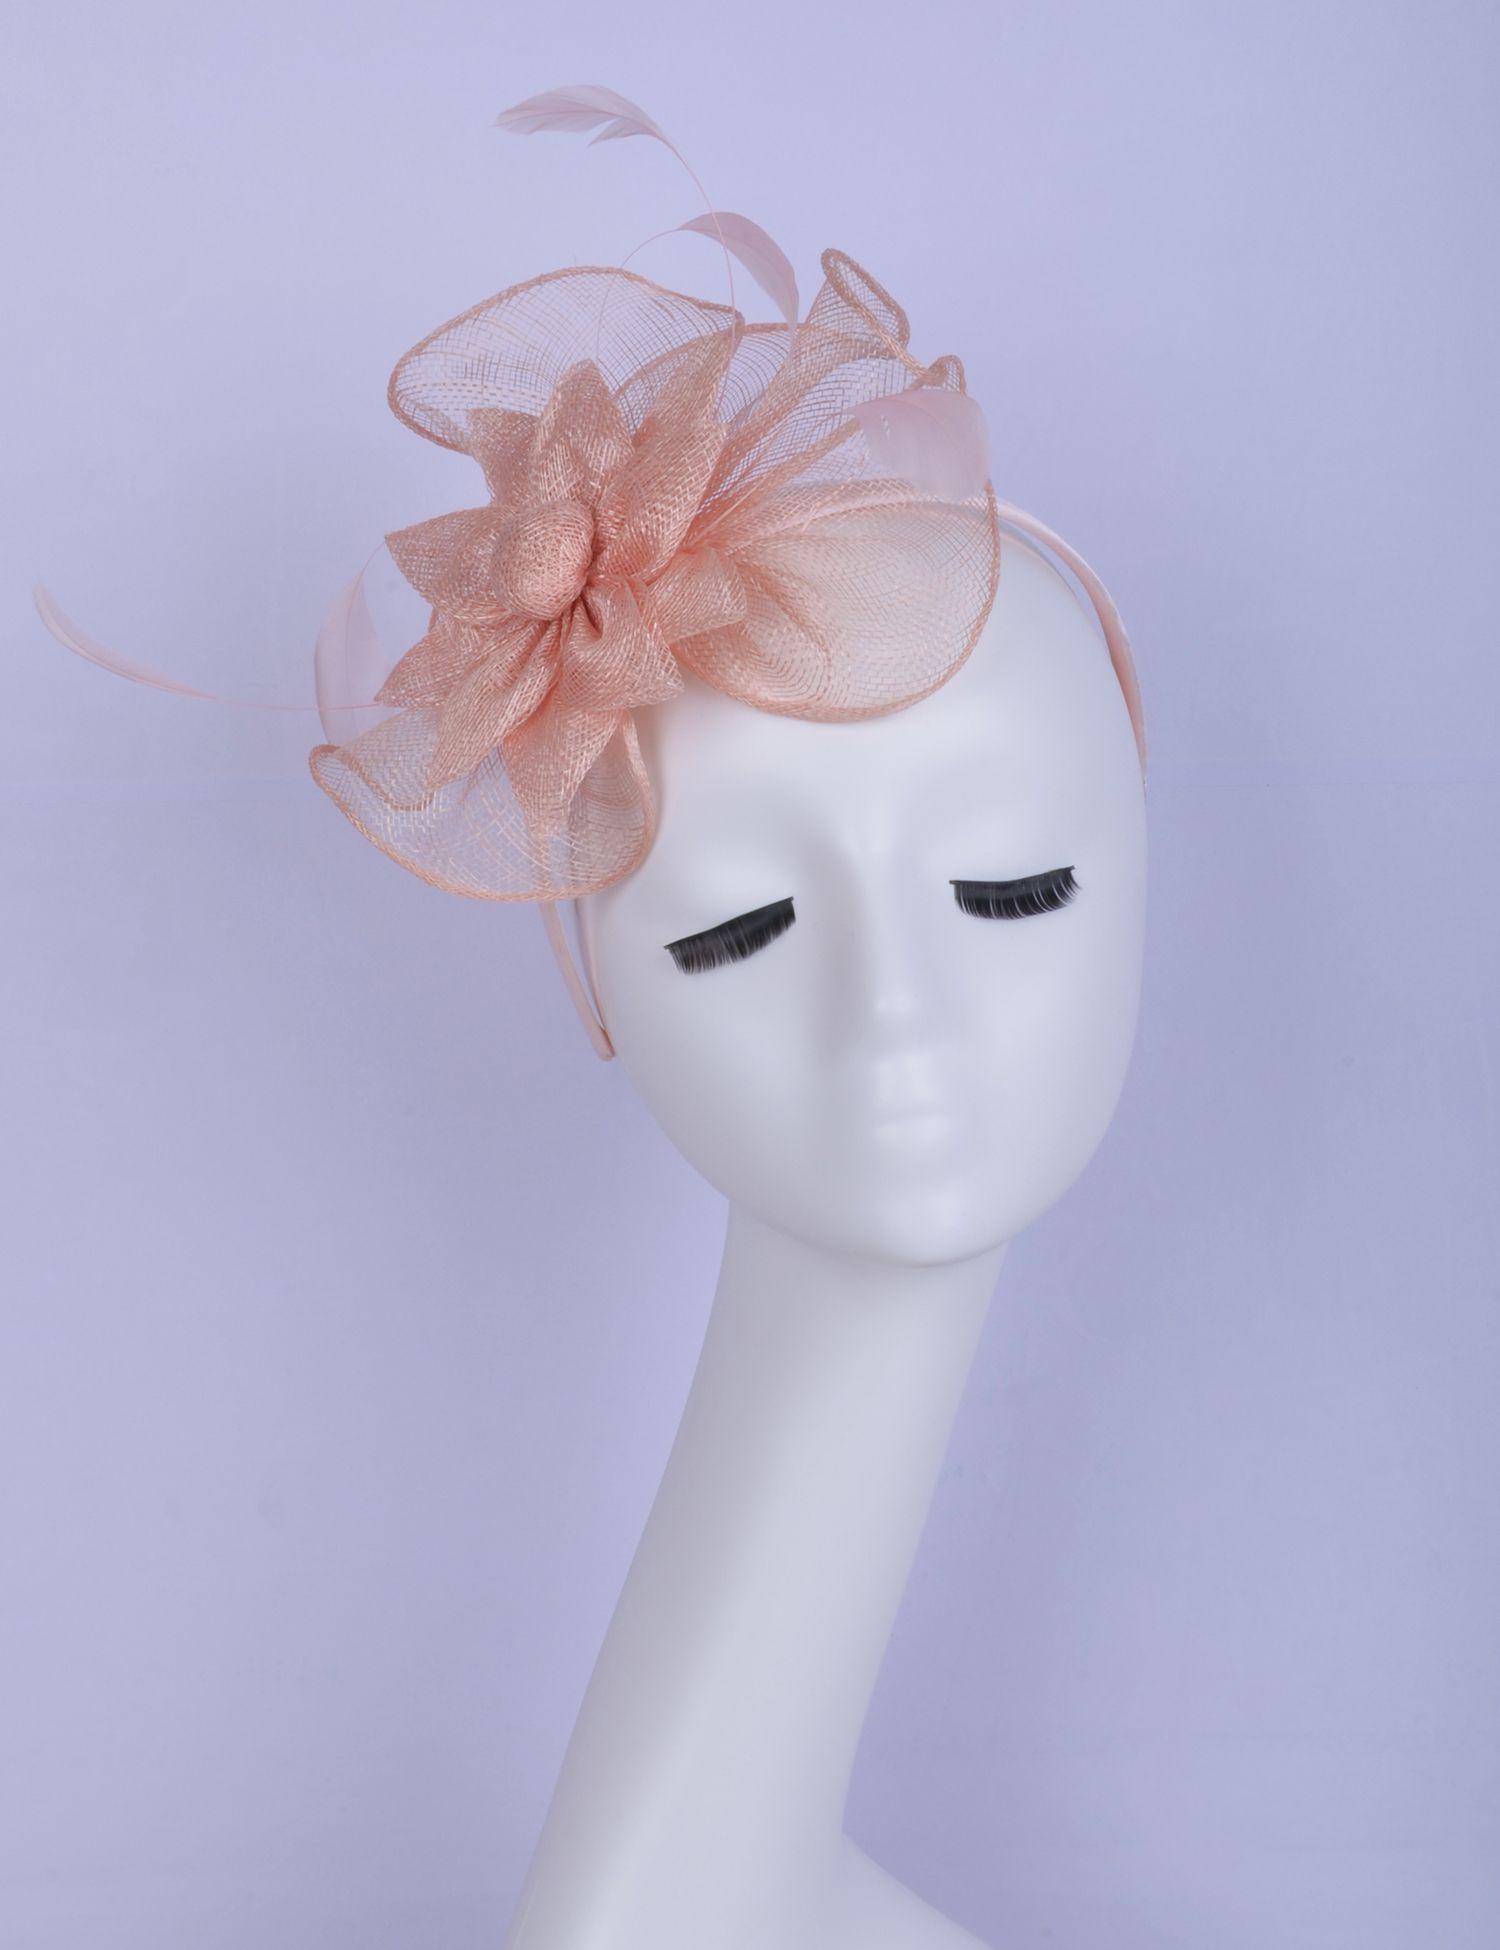 2019 Pequeno bebê rosa sinamay fascinator pena Headpiece Kentucky Derby casamento raças chuveiro nupcial mãe da noiva.